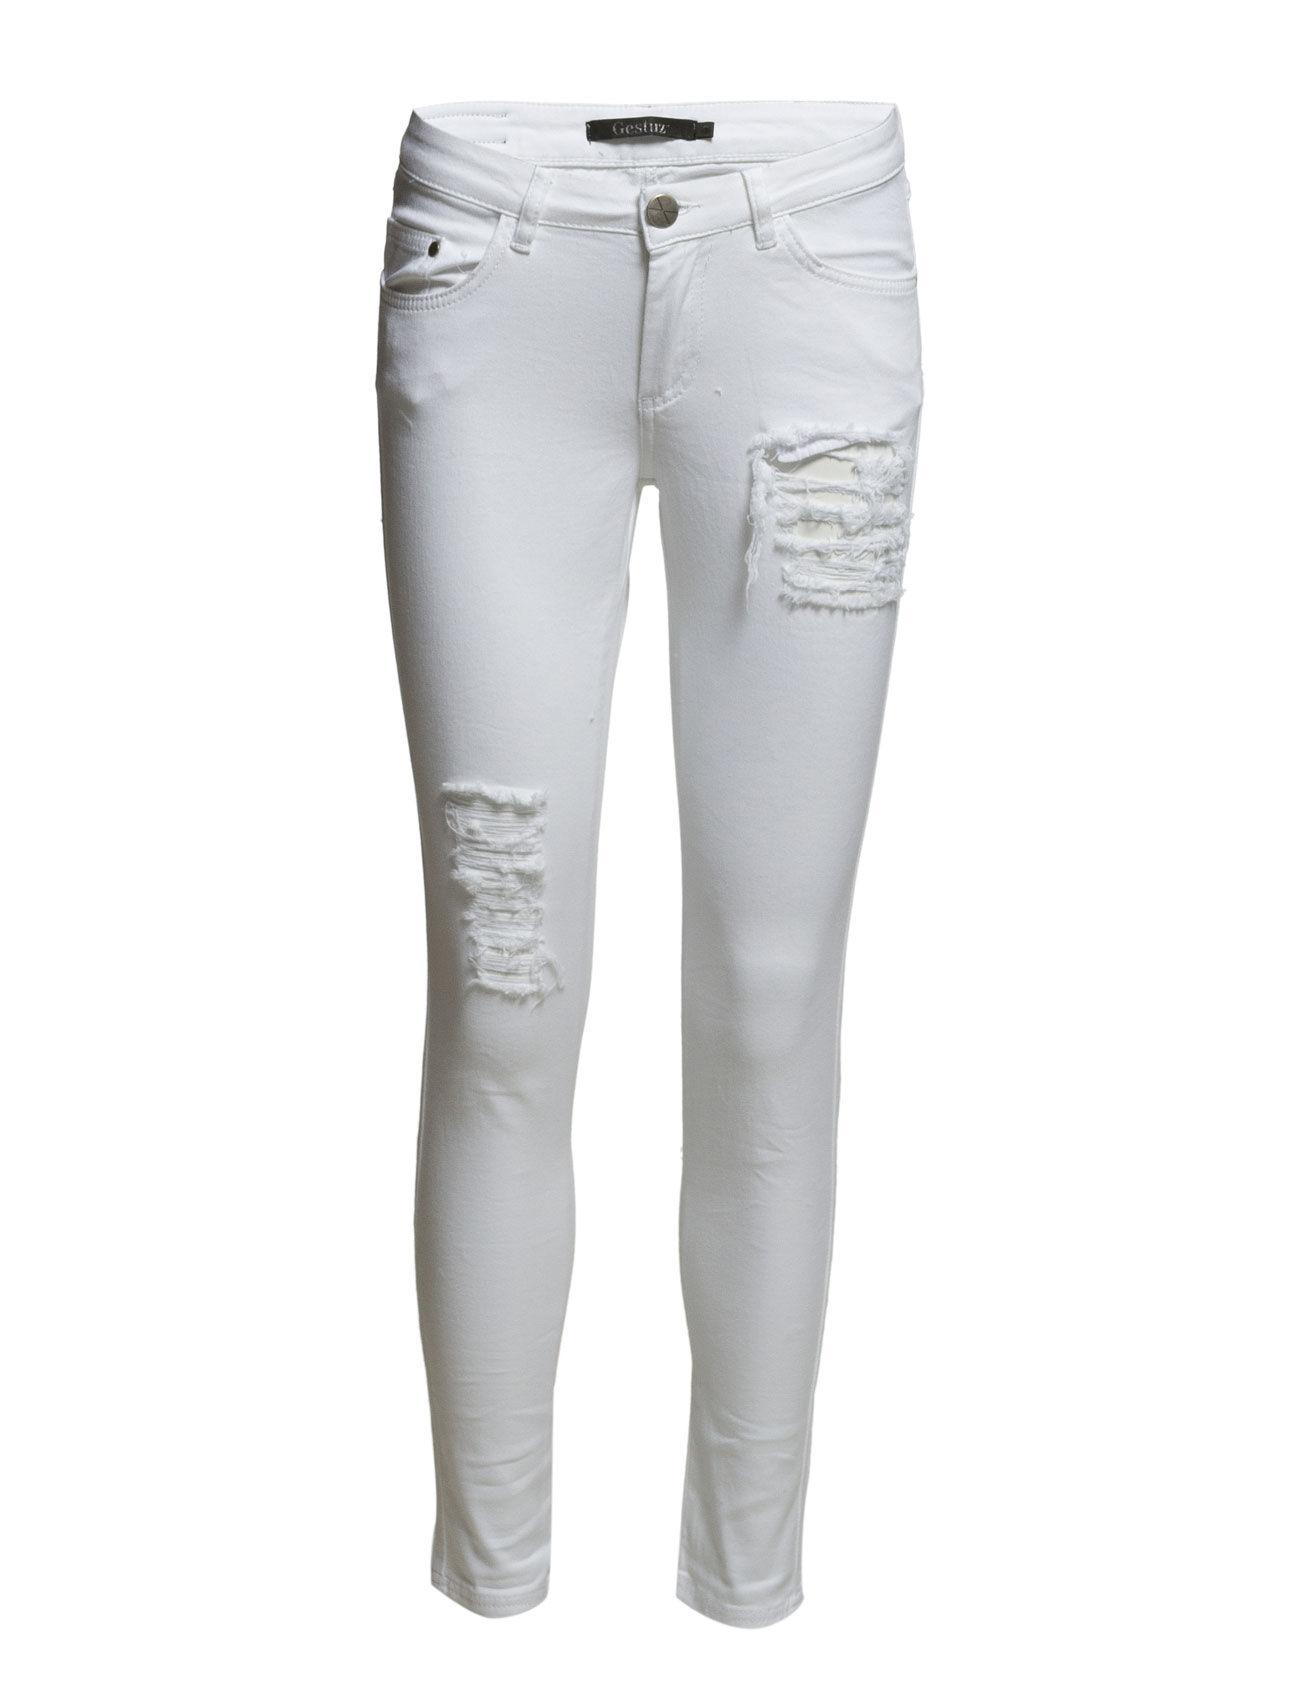 Ivy Jeans Ms 14 Design